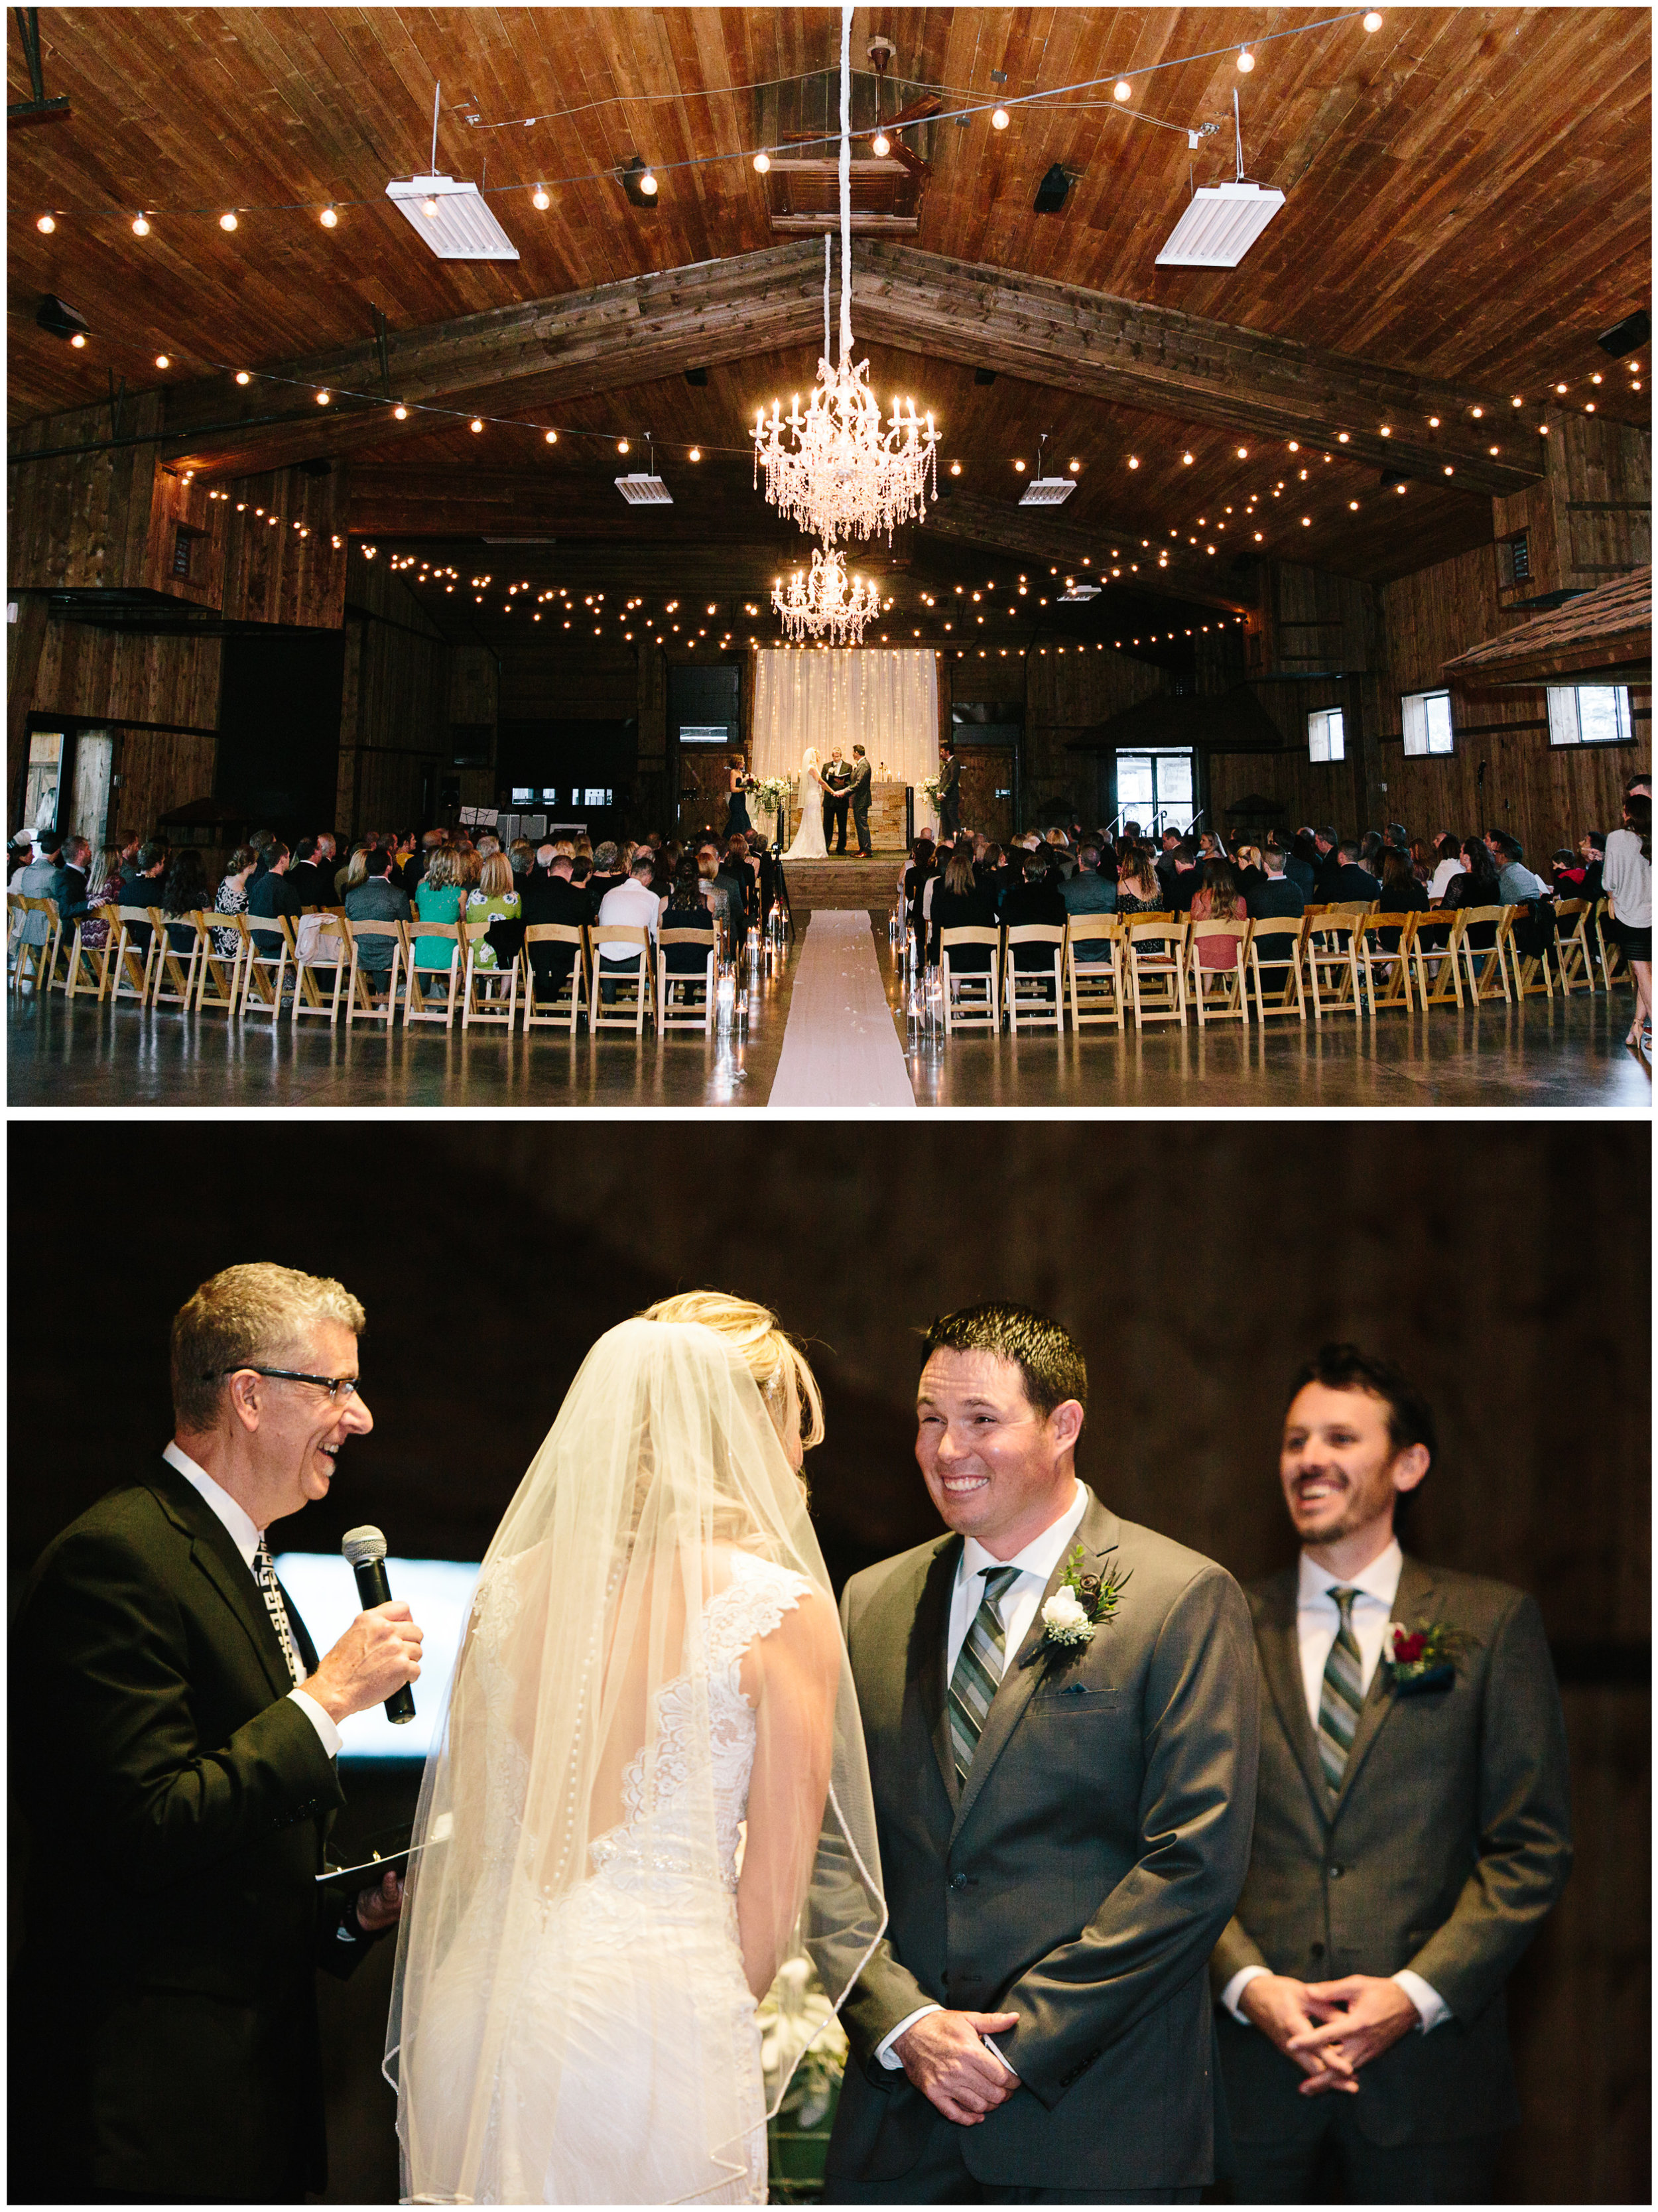 spruce_mountain_ranch_wedding_45.jpg